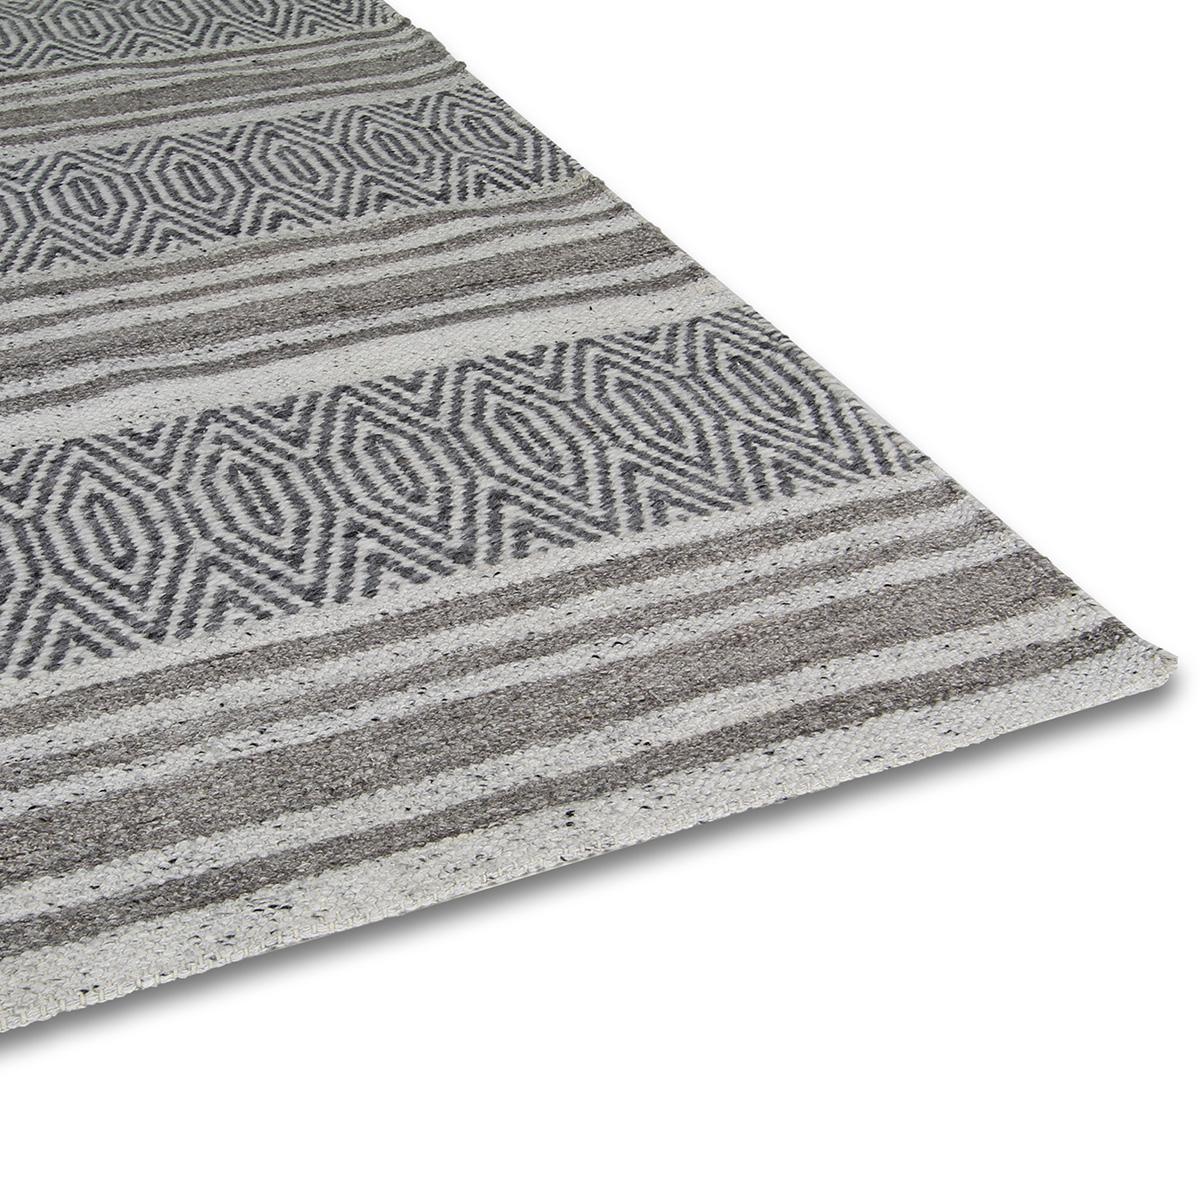 Vloerkleed Brinker Rain Grey | 160 x 230 cm